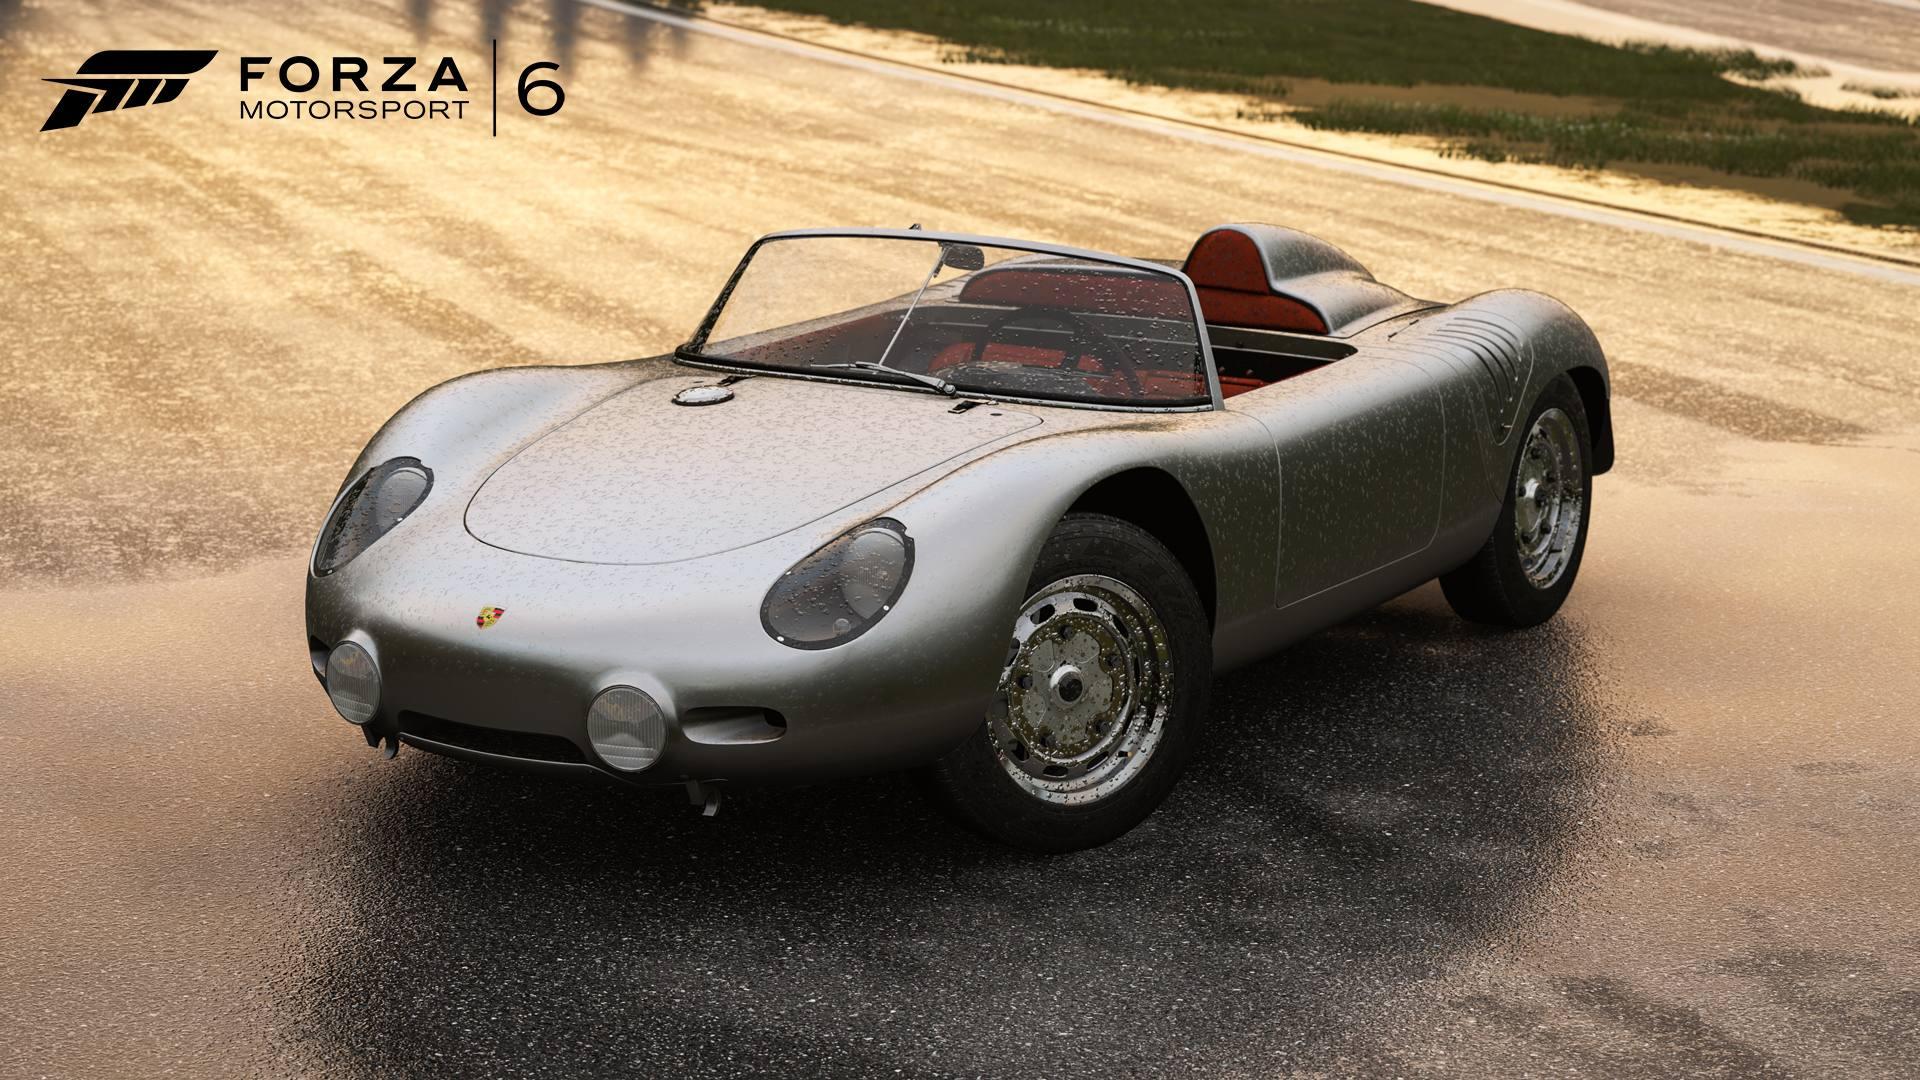 Forza Motorsport 6 01-03-16 1960 Porsche 718 RS 60